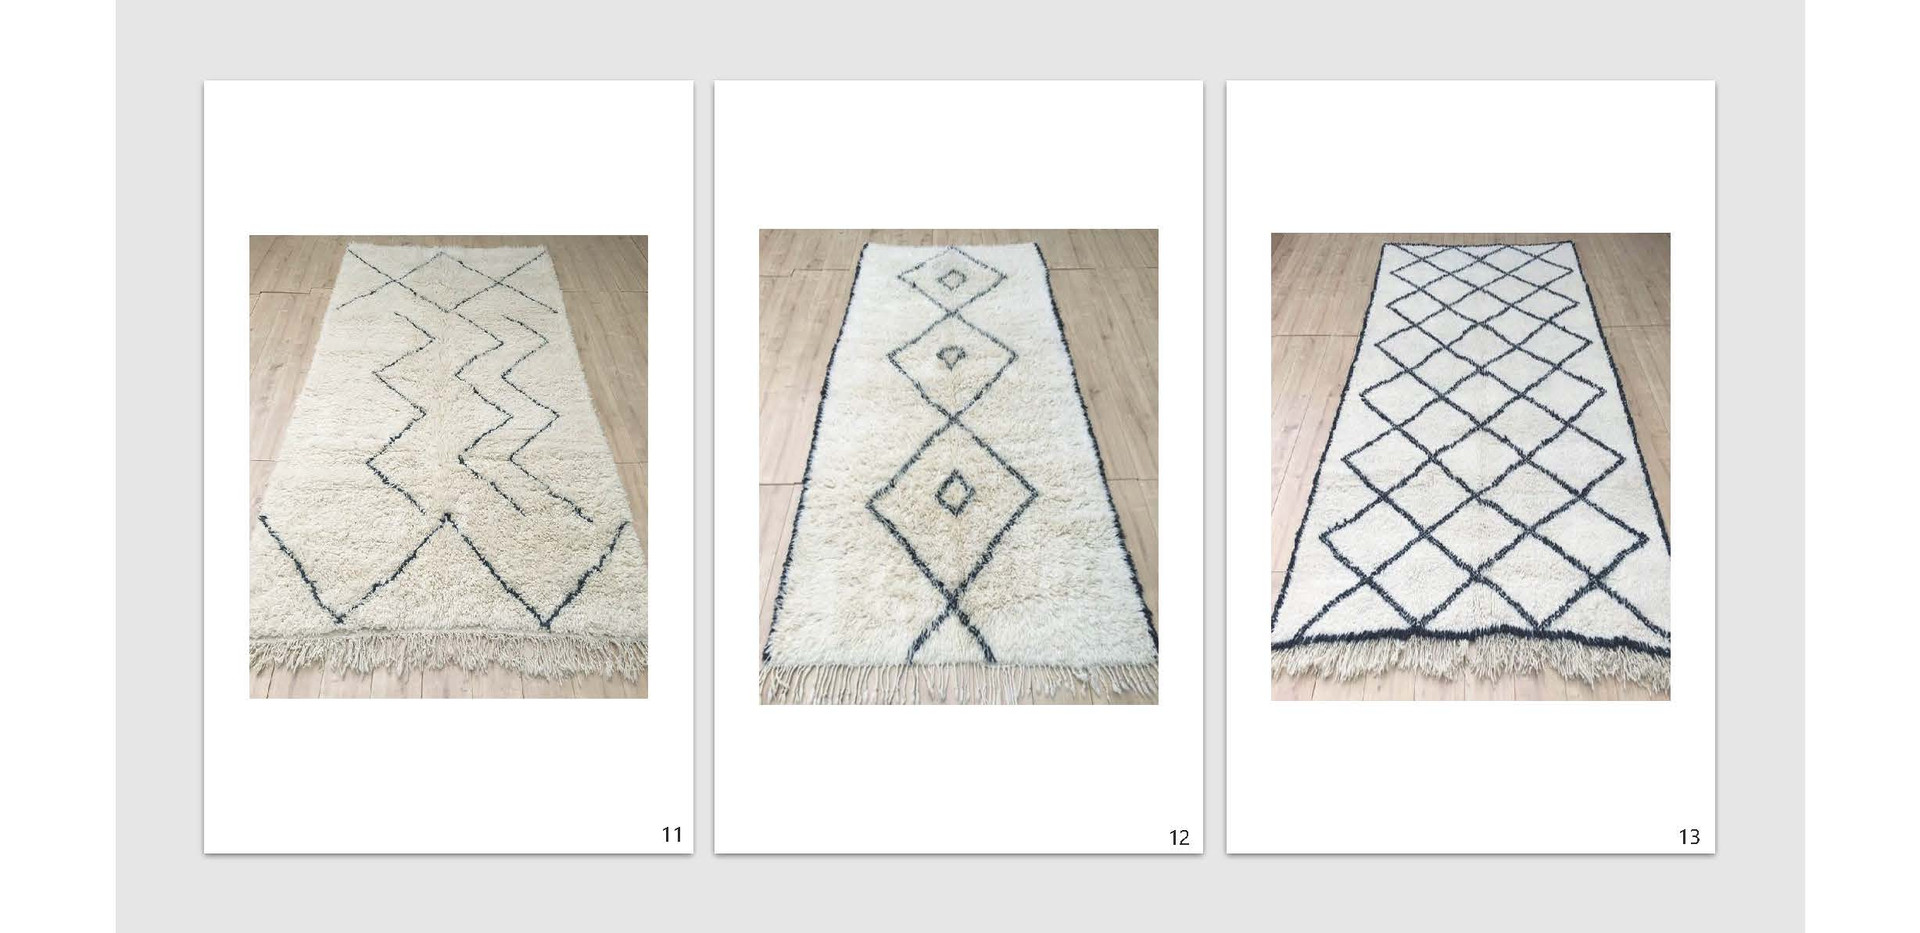 5. Berber Style 07.jpg